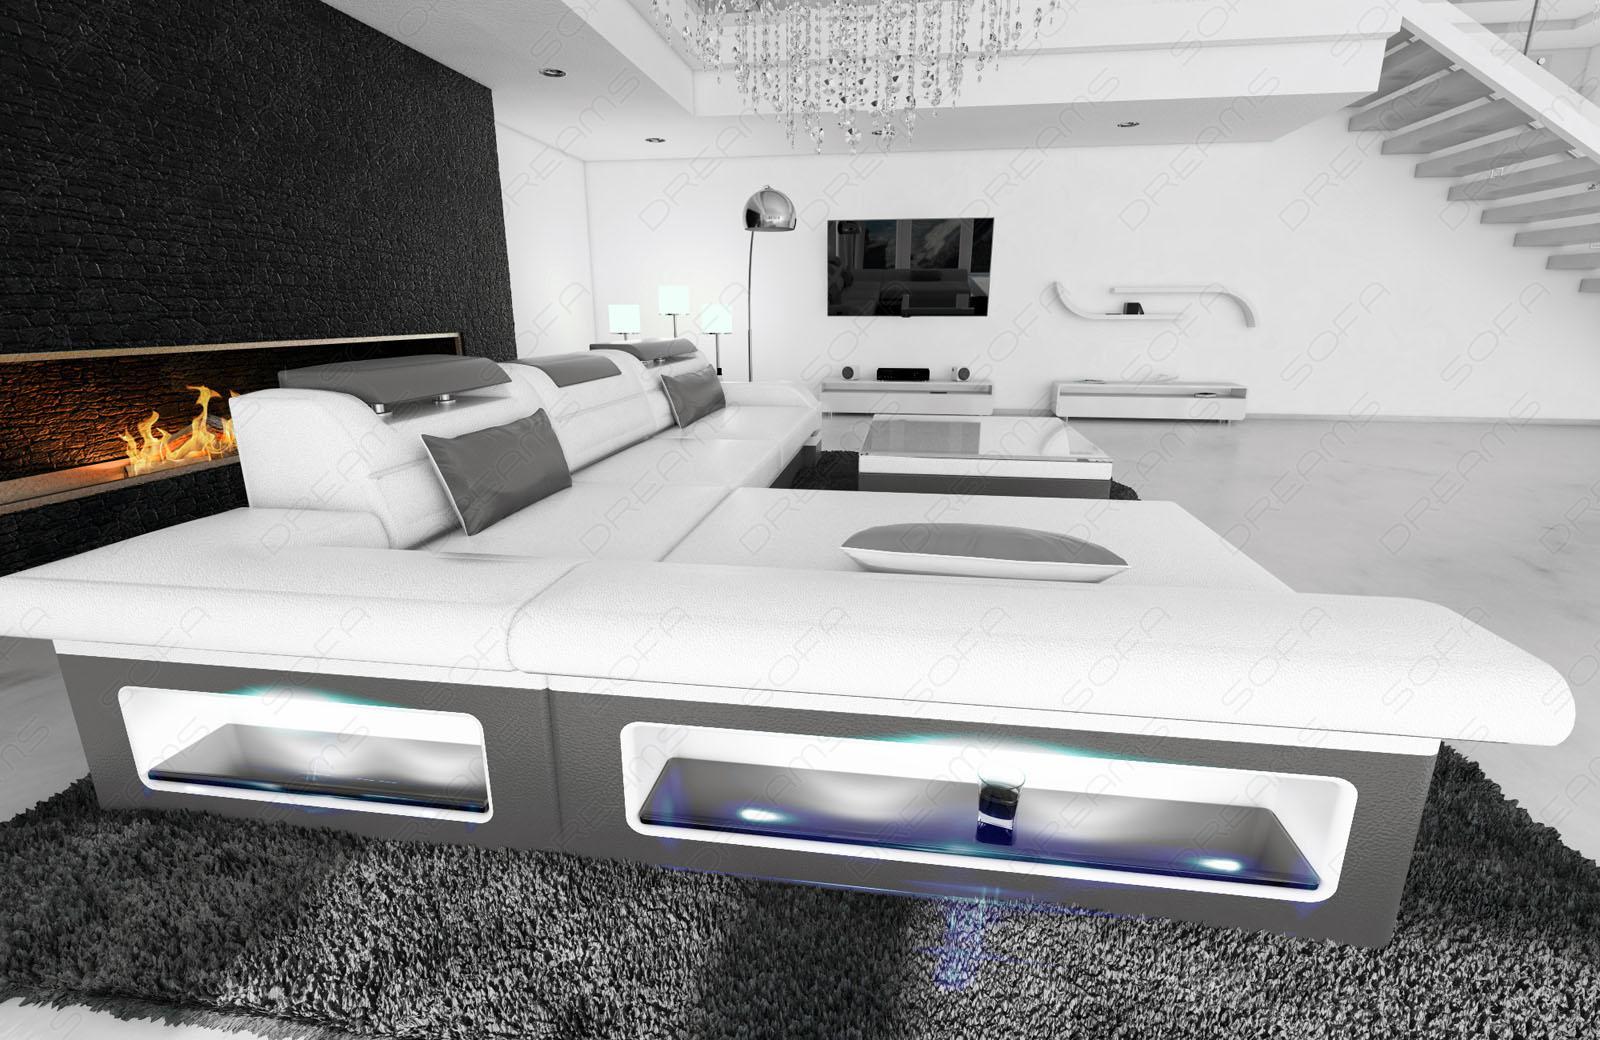 ledersofa monza l weiss grau kaufen bei pmr handelsgesellschaft mbh. Black Bedroom Furniture Sets. Home Design Ideas